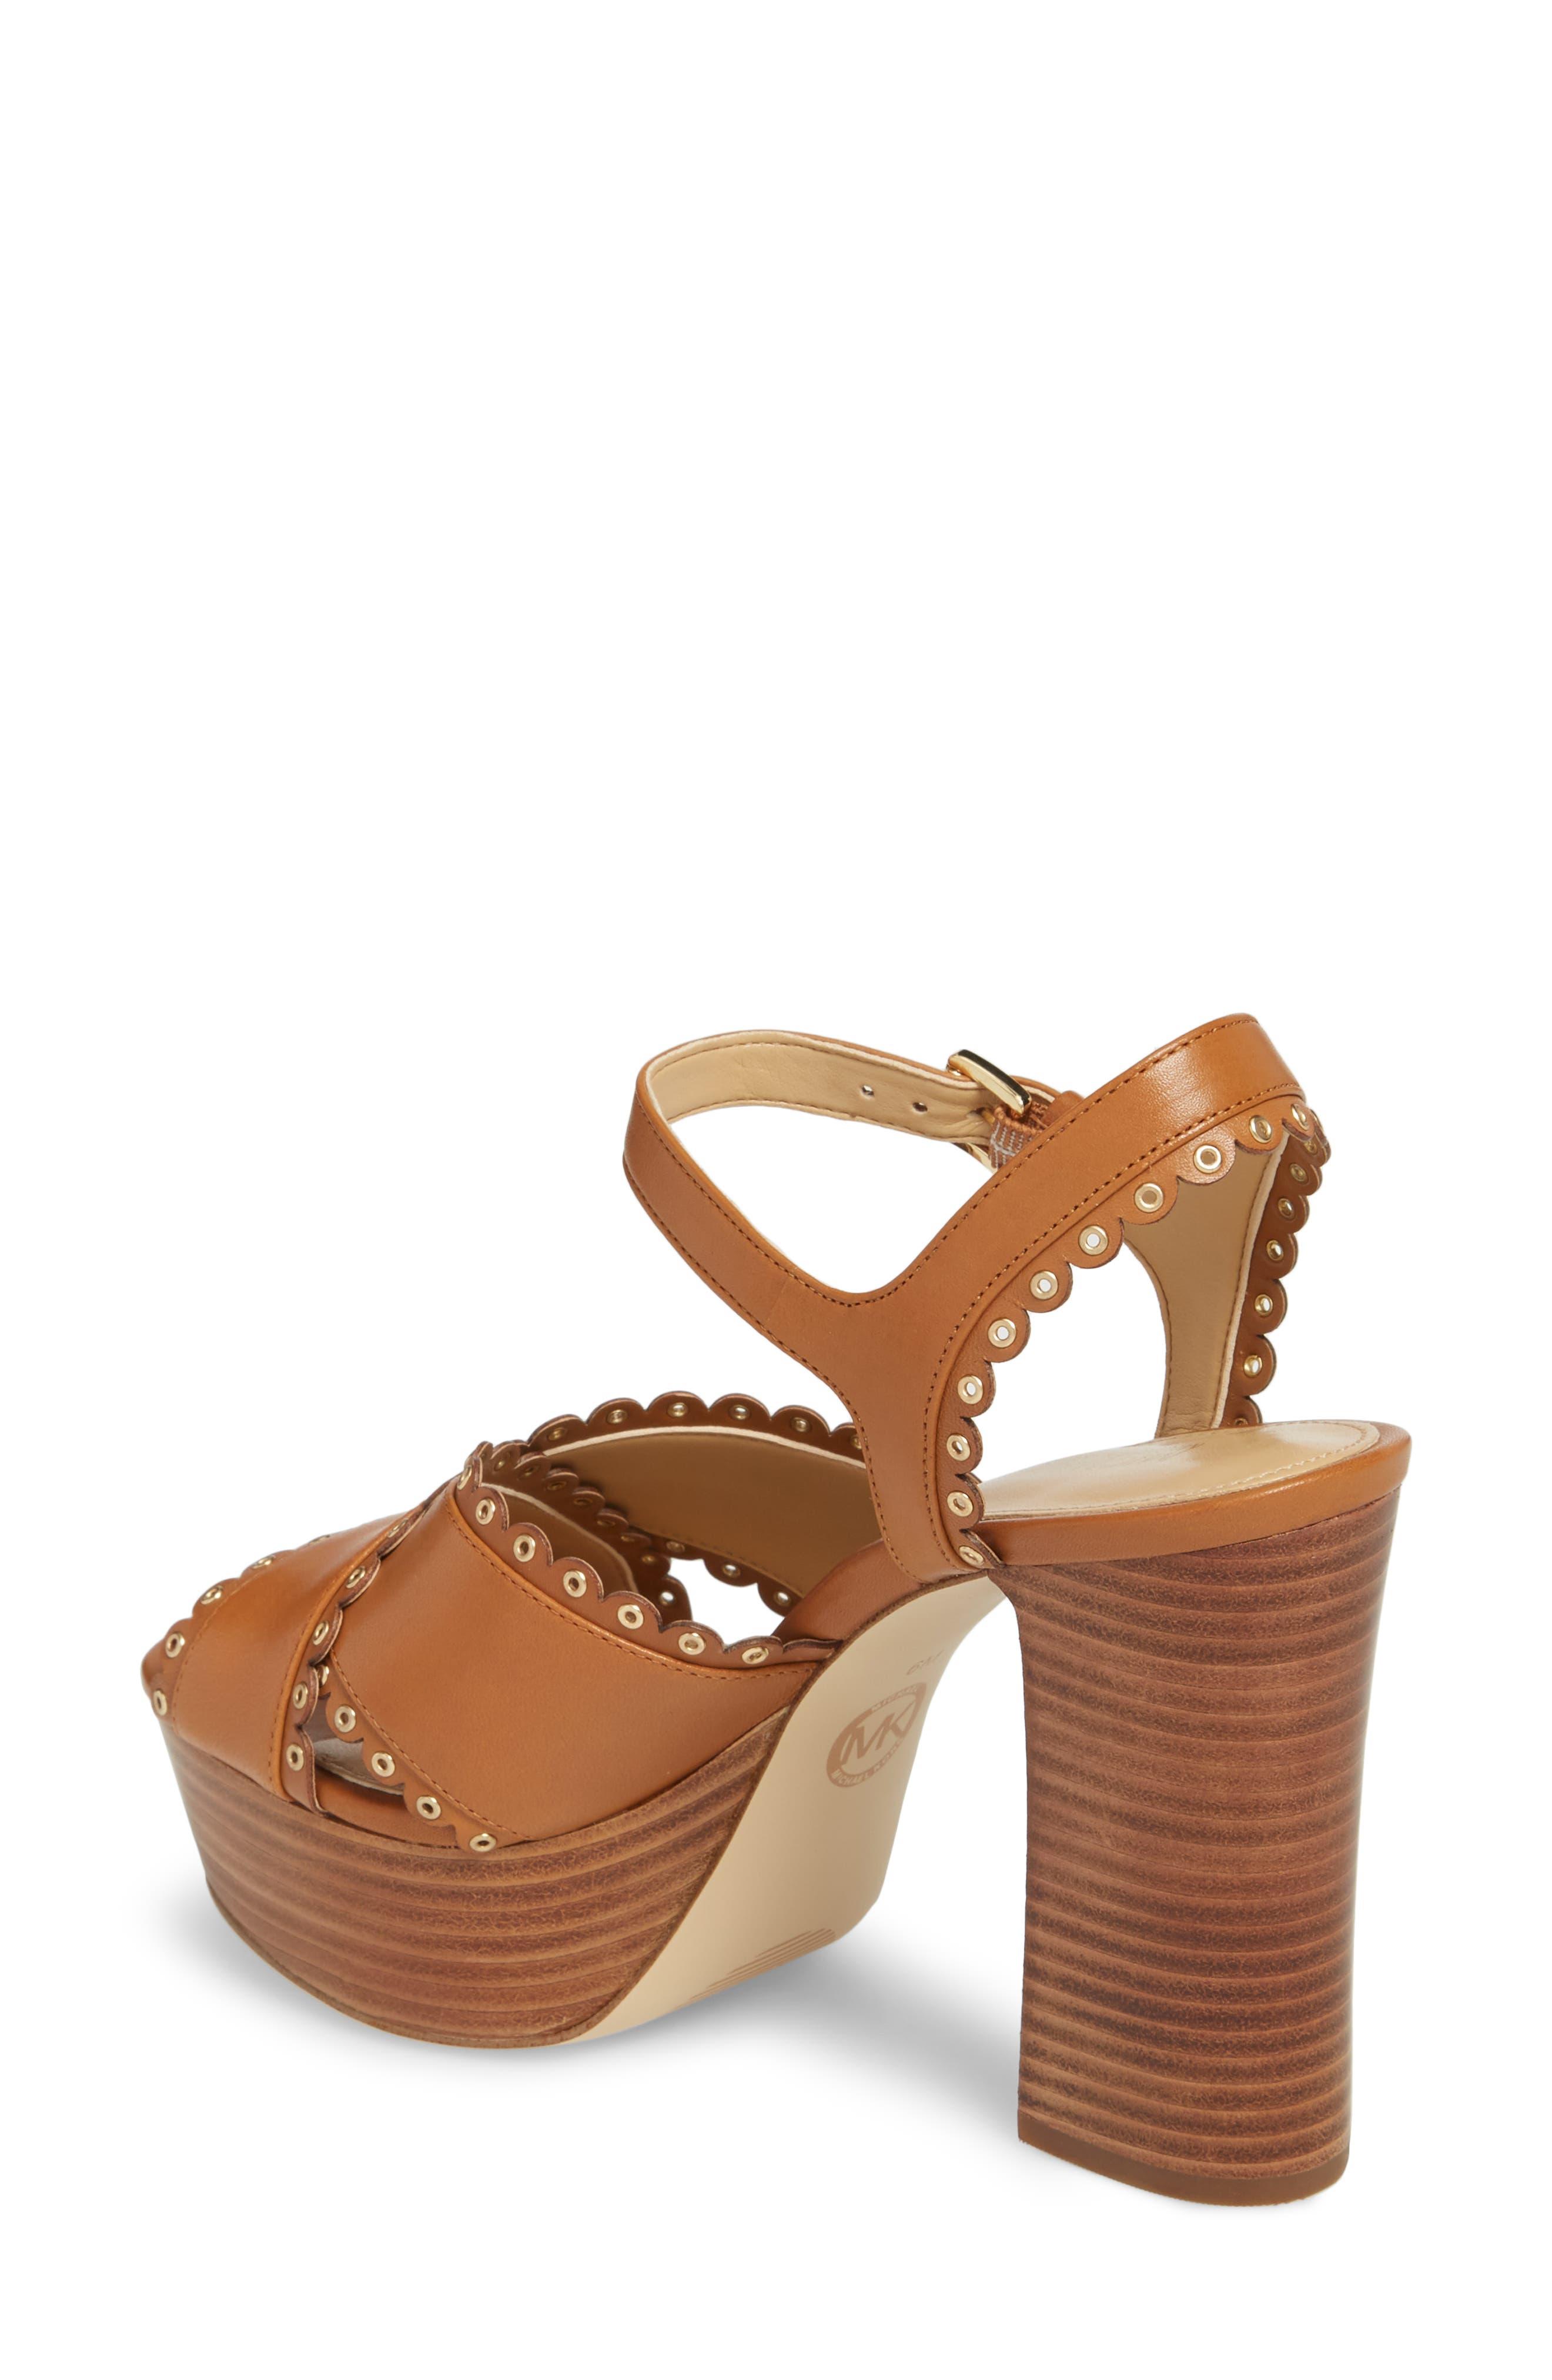 Jessie Platform Sandal,                             Alternate thumbnail 2, color,                             Acorn Leather